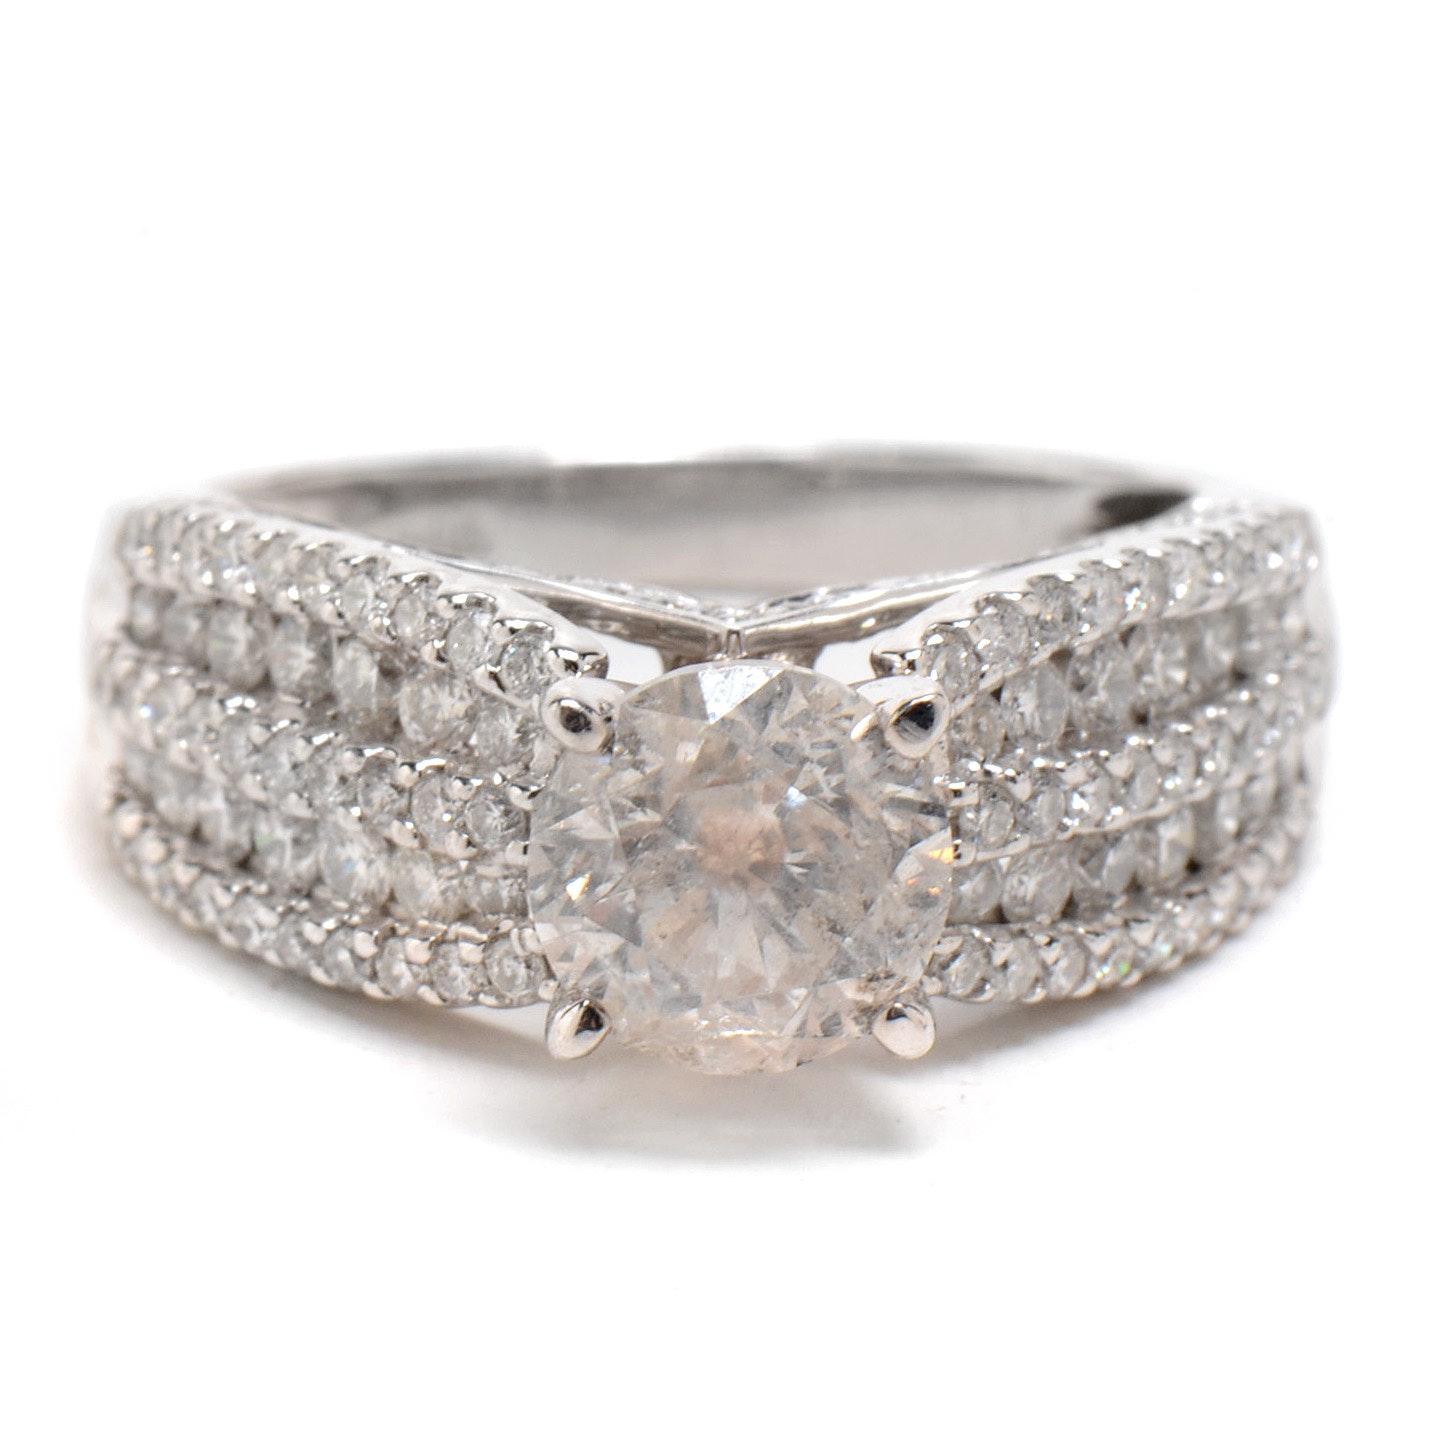 14K White Gold 2.19 CTW Diamond Statement Ring